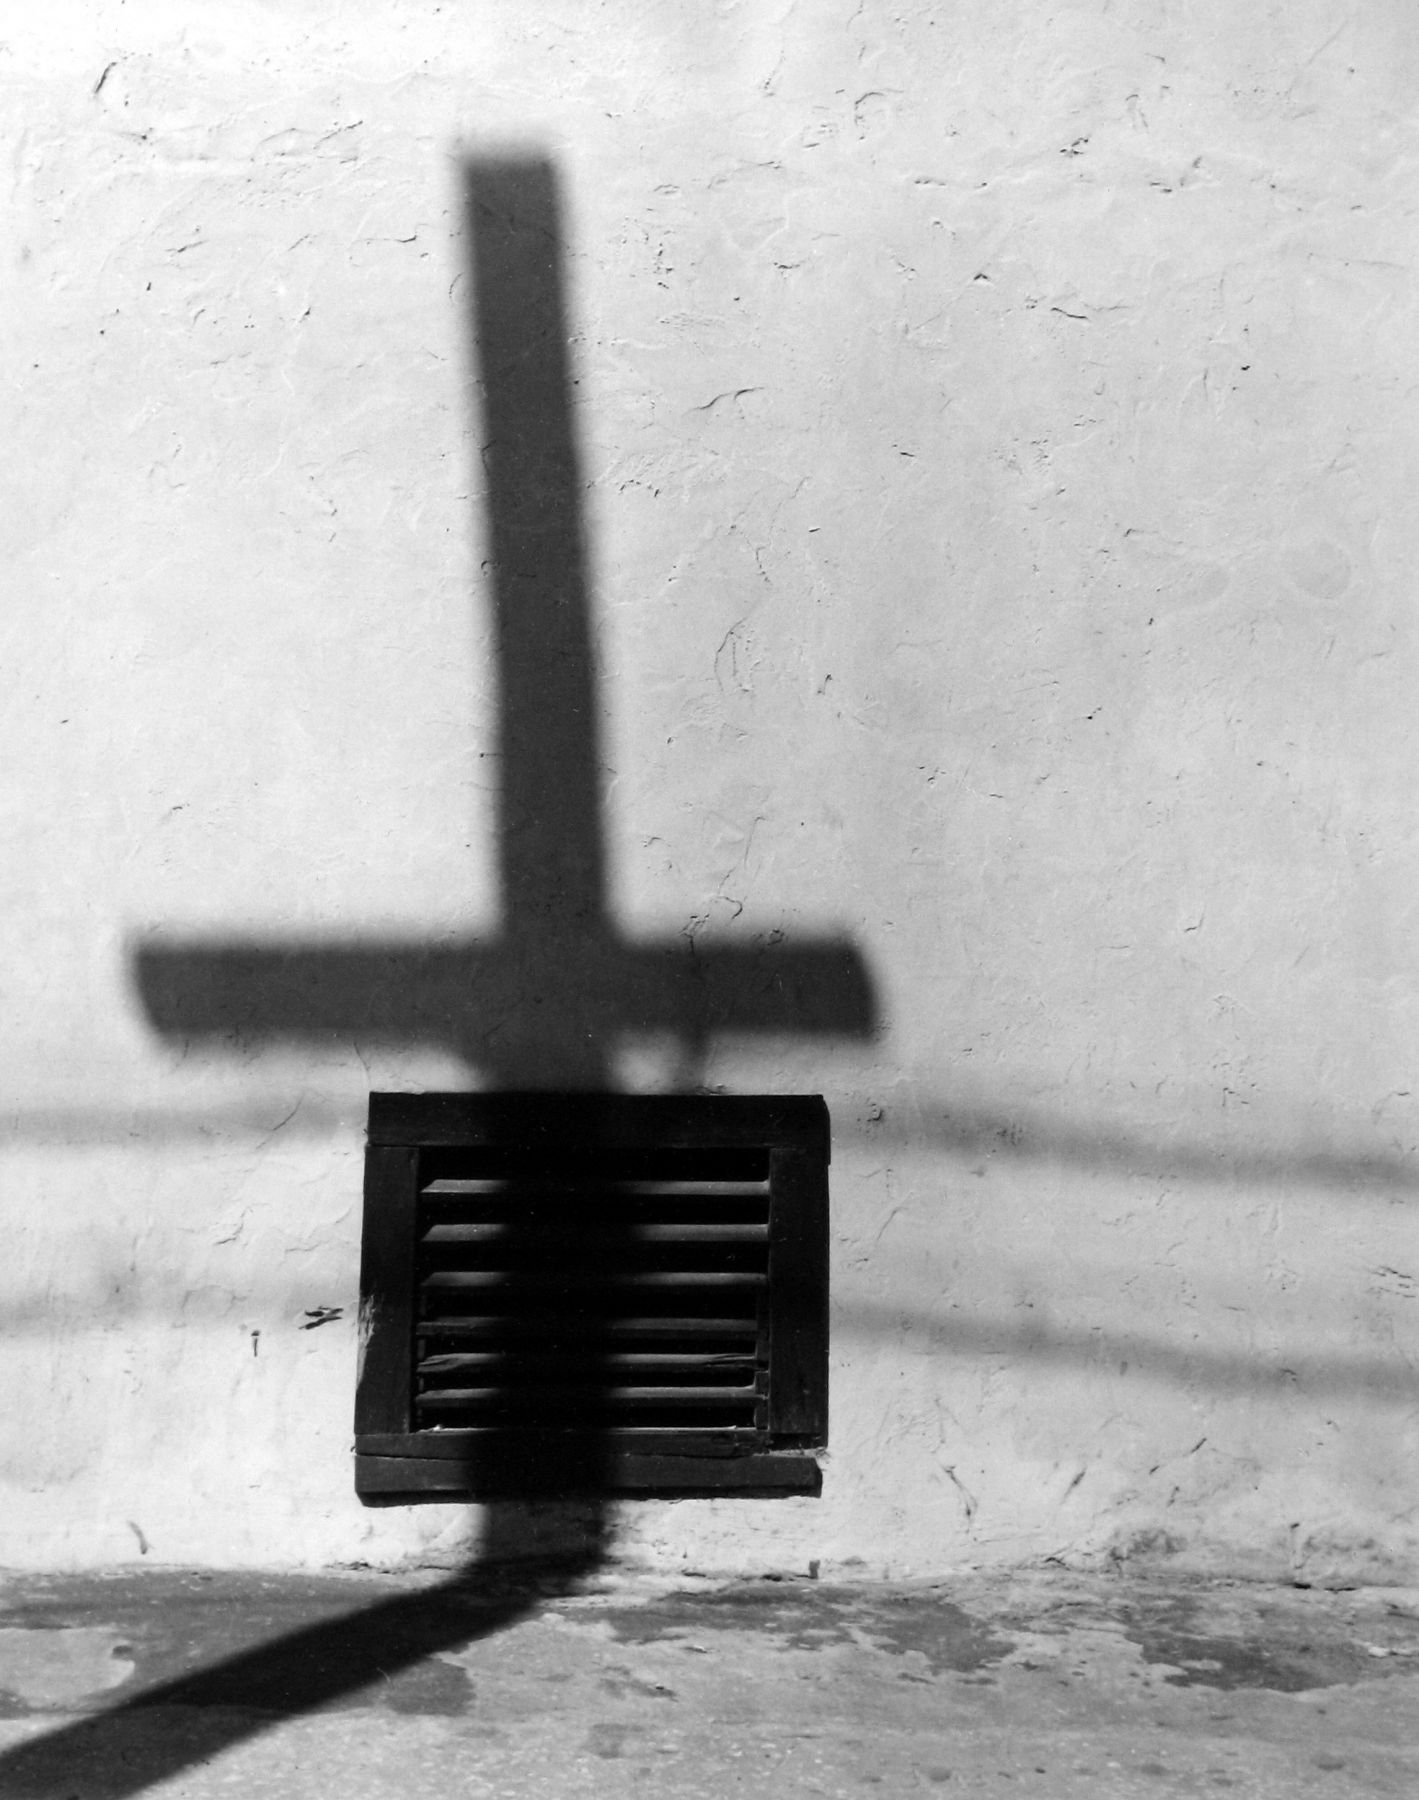 Arnold Newman - Shadow of Light Poles, West Palm Beach, FL, 1941 - Howard Greenberg Gallery - 2018